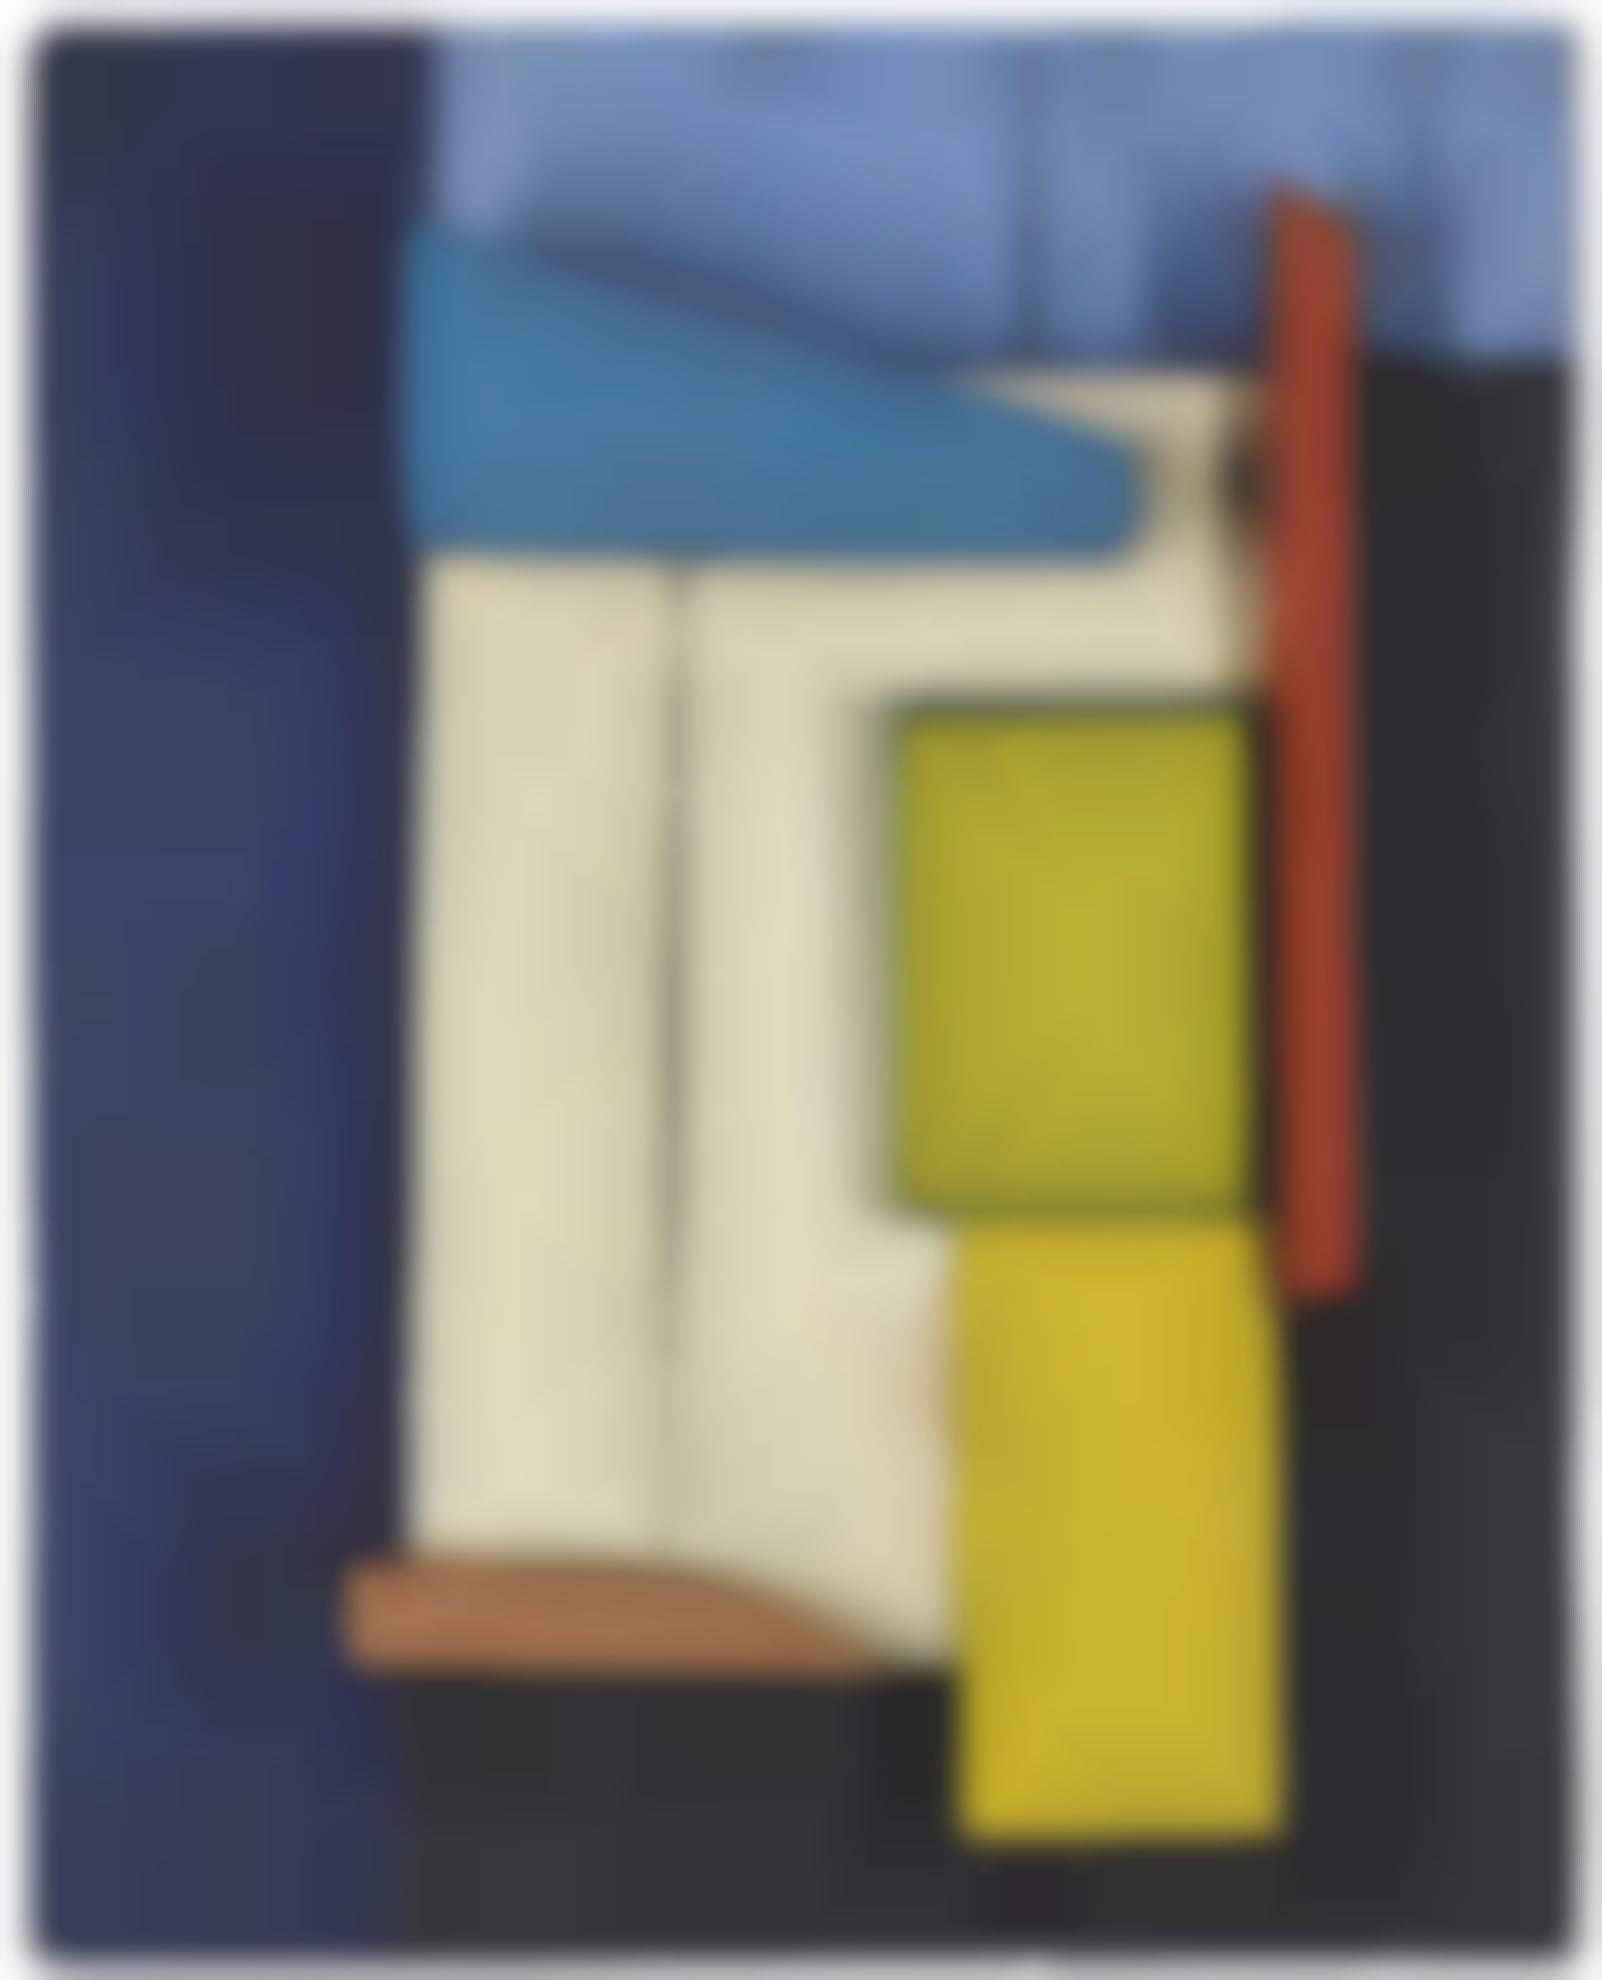 Kurt Schwitters-Blau (Blue)-1926